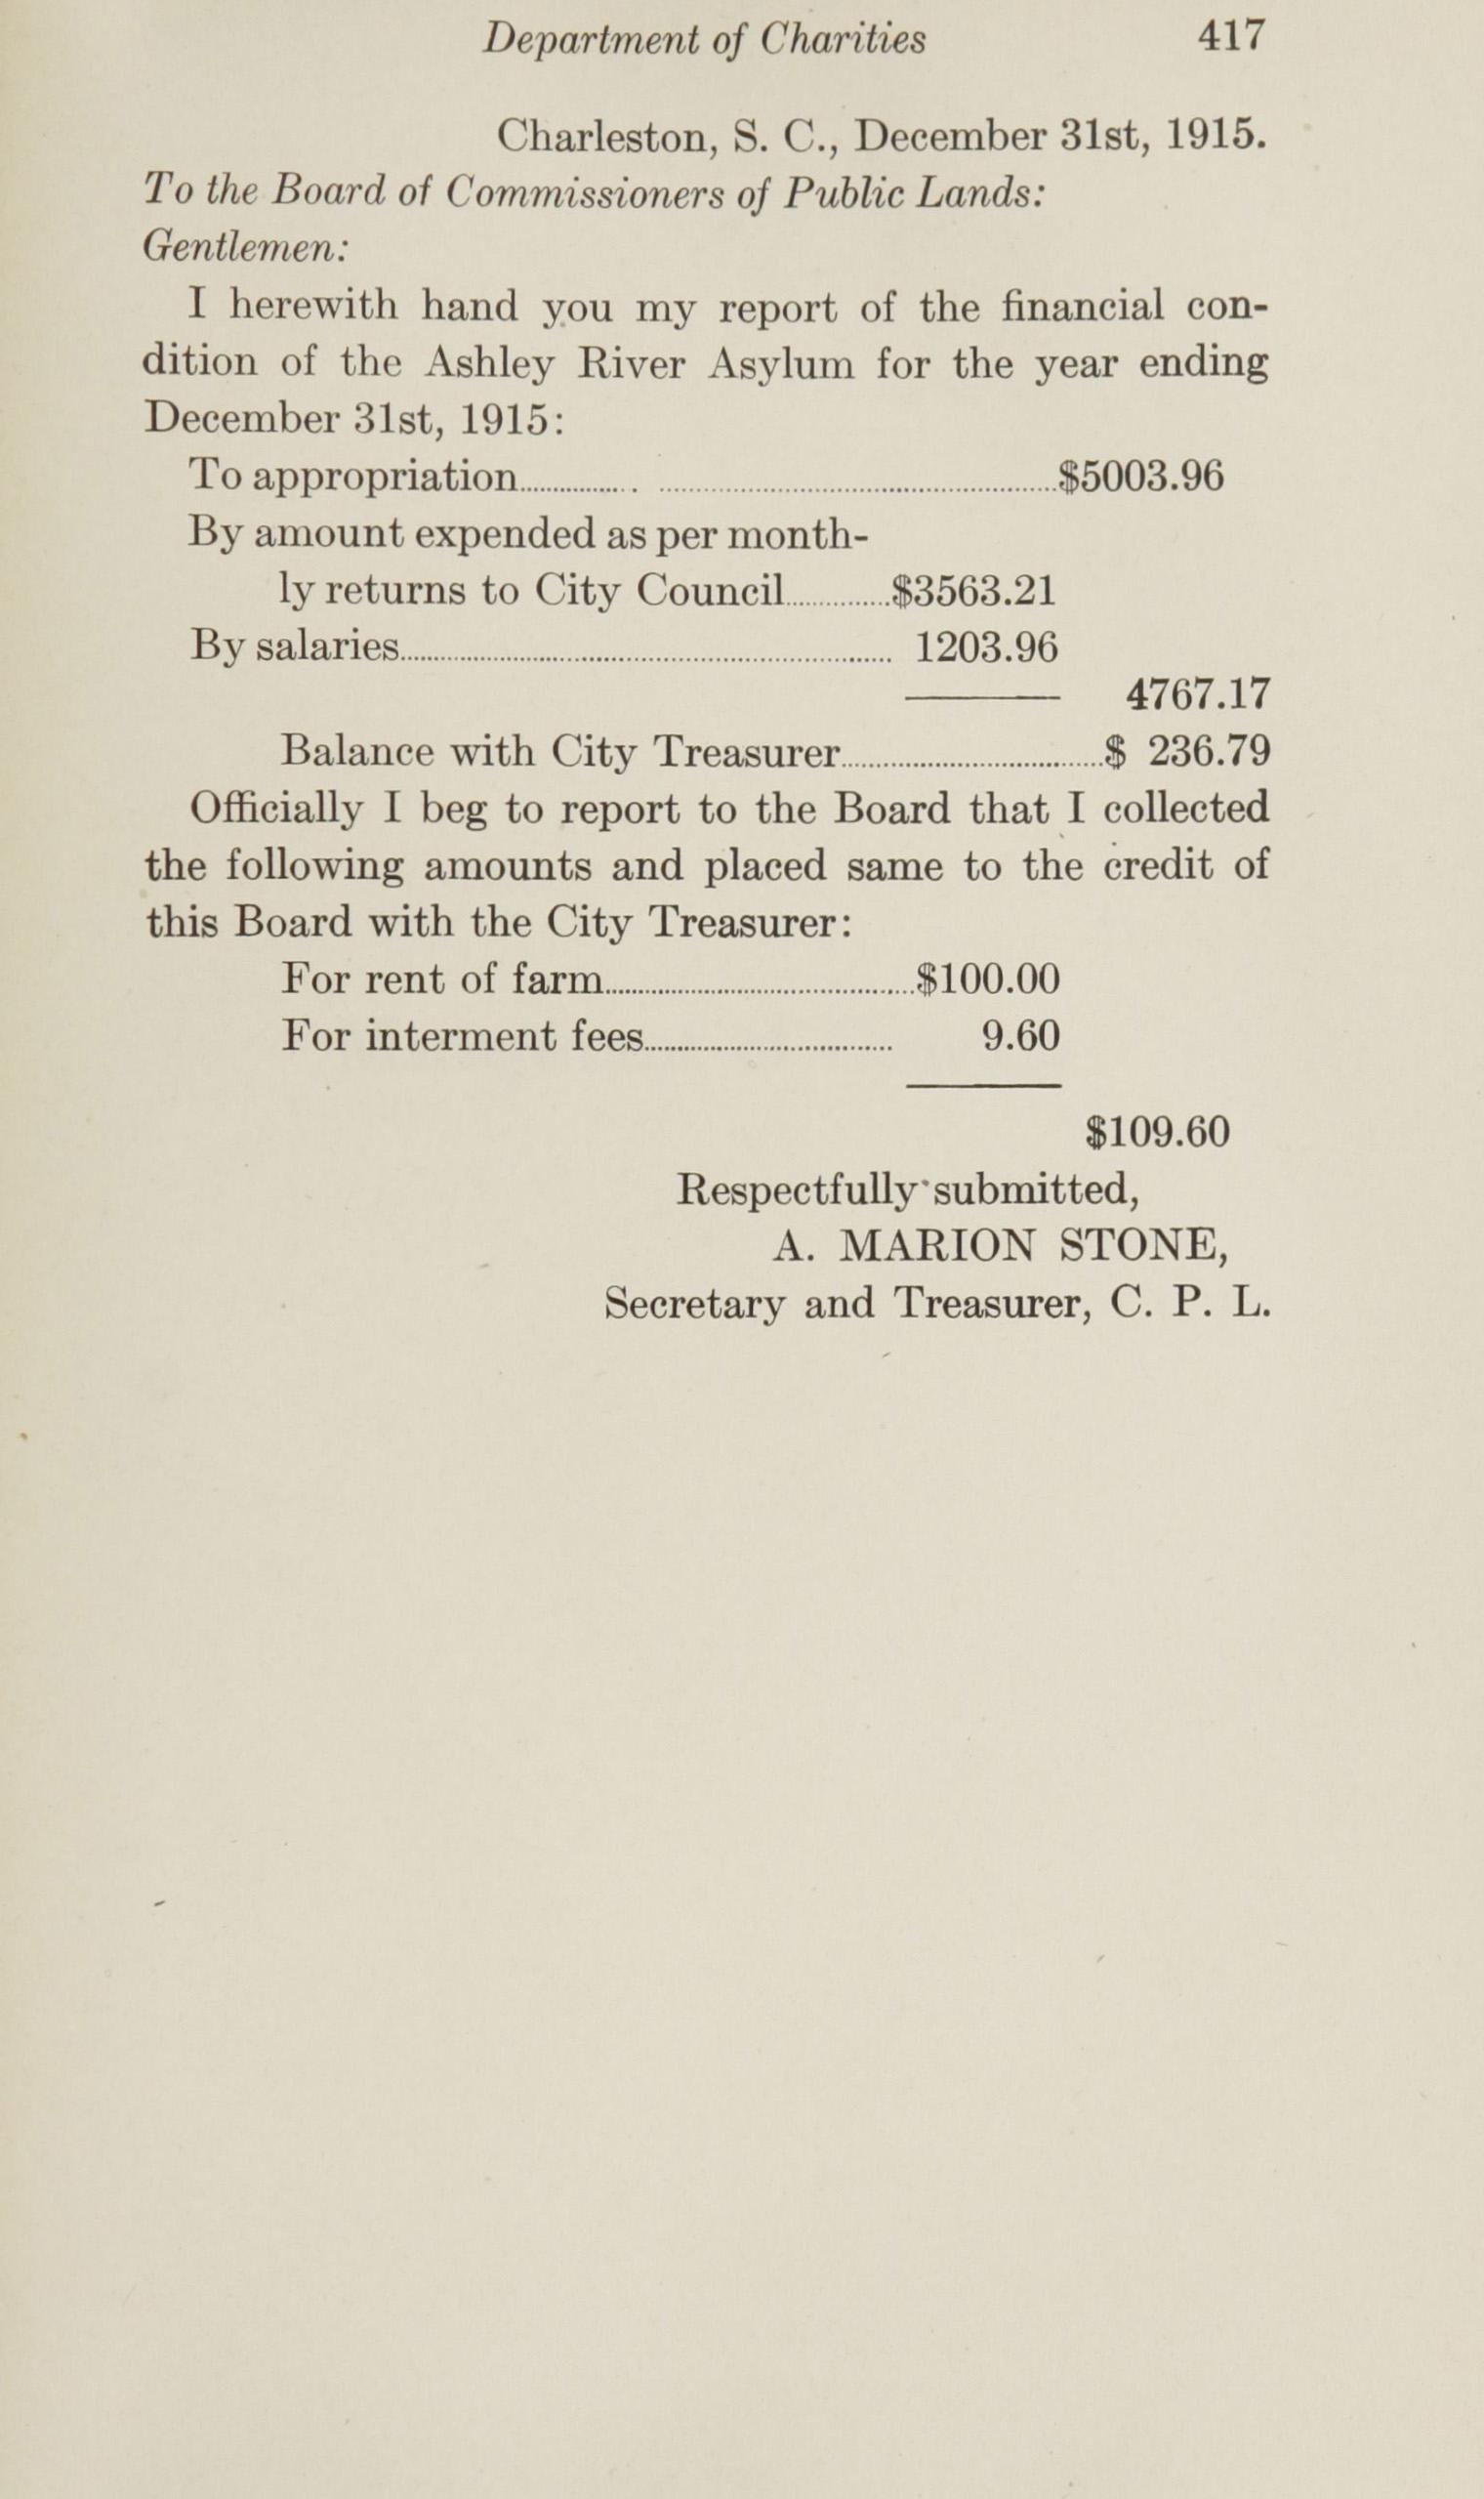 Charleston Yearbook, 1915, page 417